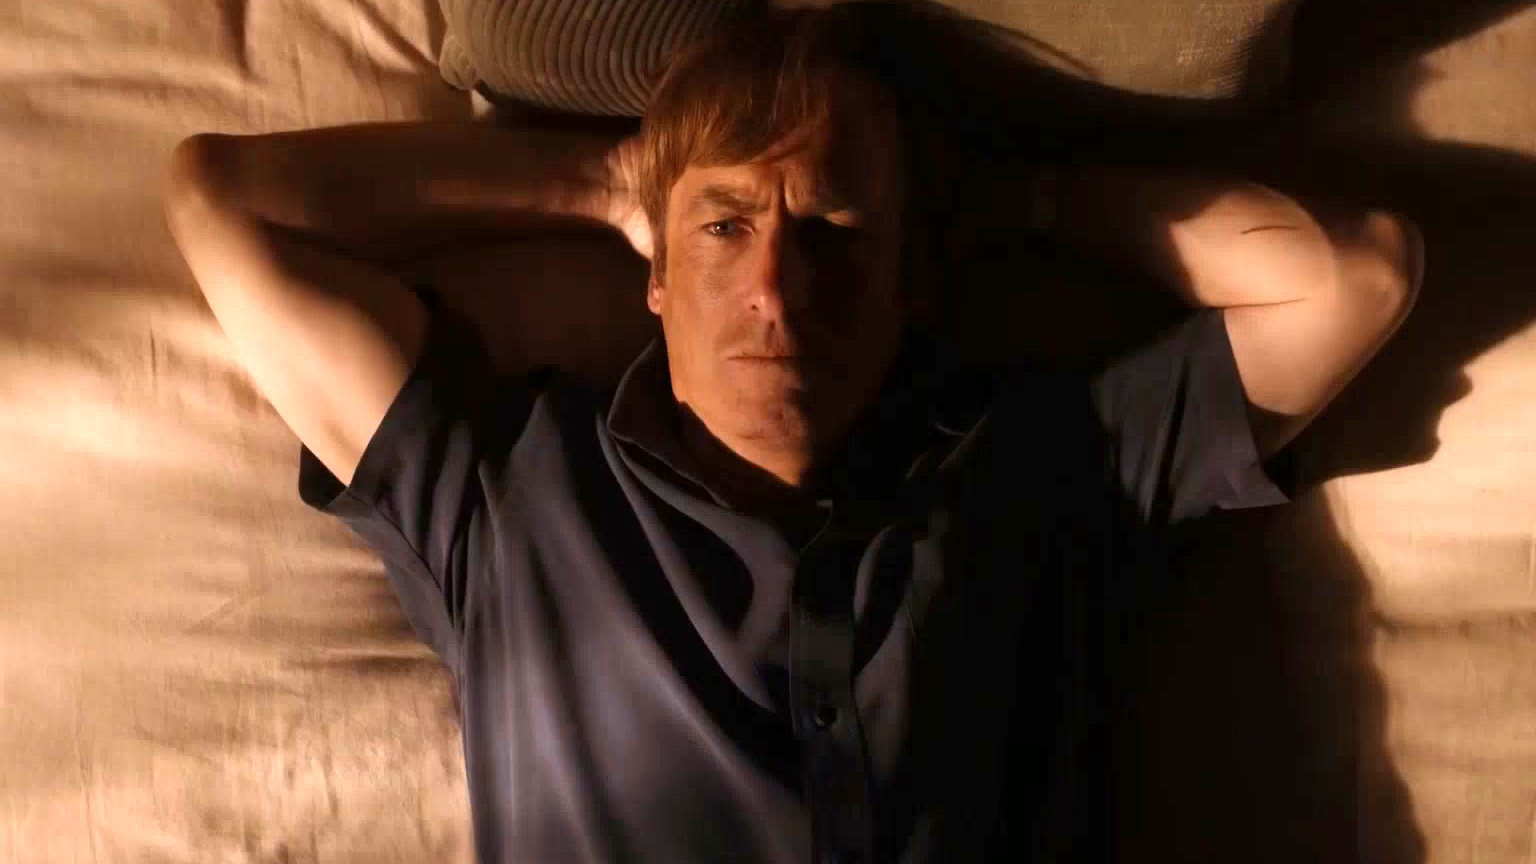 Better Call Saul: Something Unforgivable